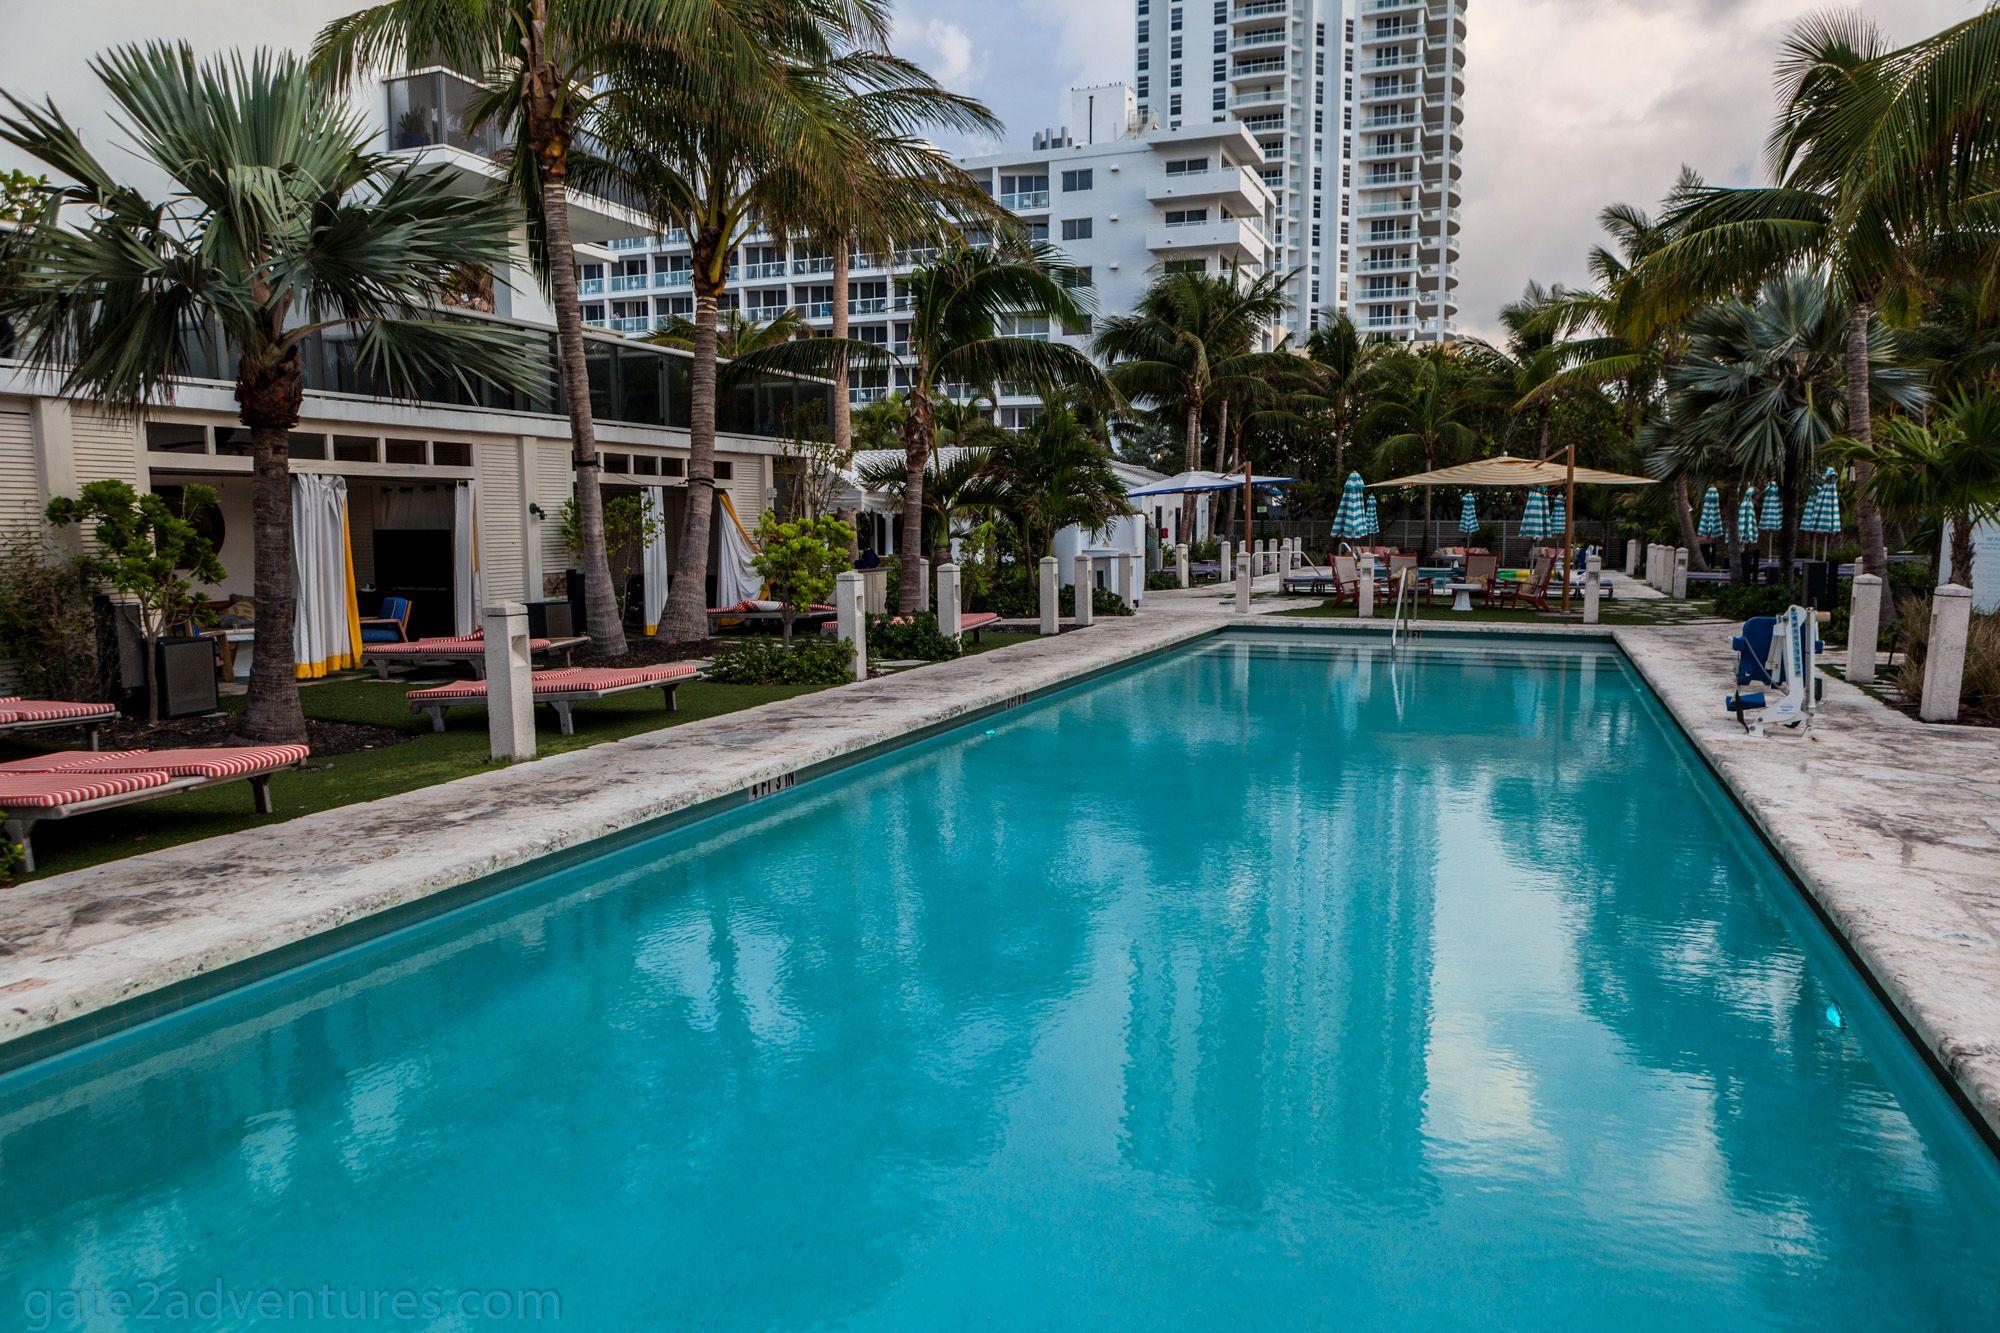 Hotel Review: The Confidante – Miami Suite: A Hyatt Unbound Collection Property